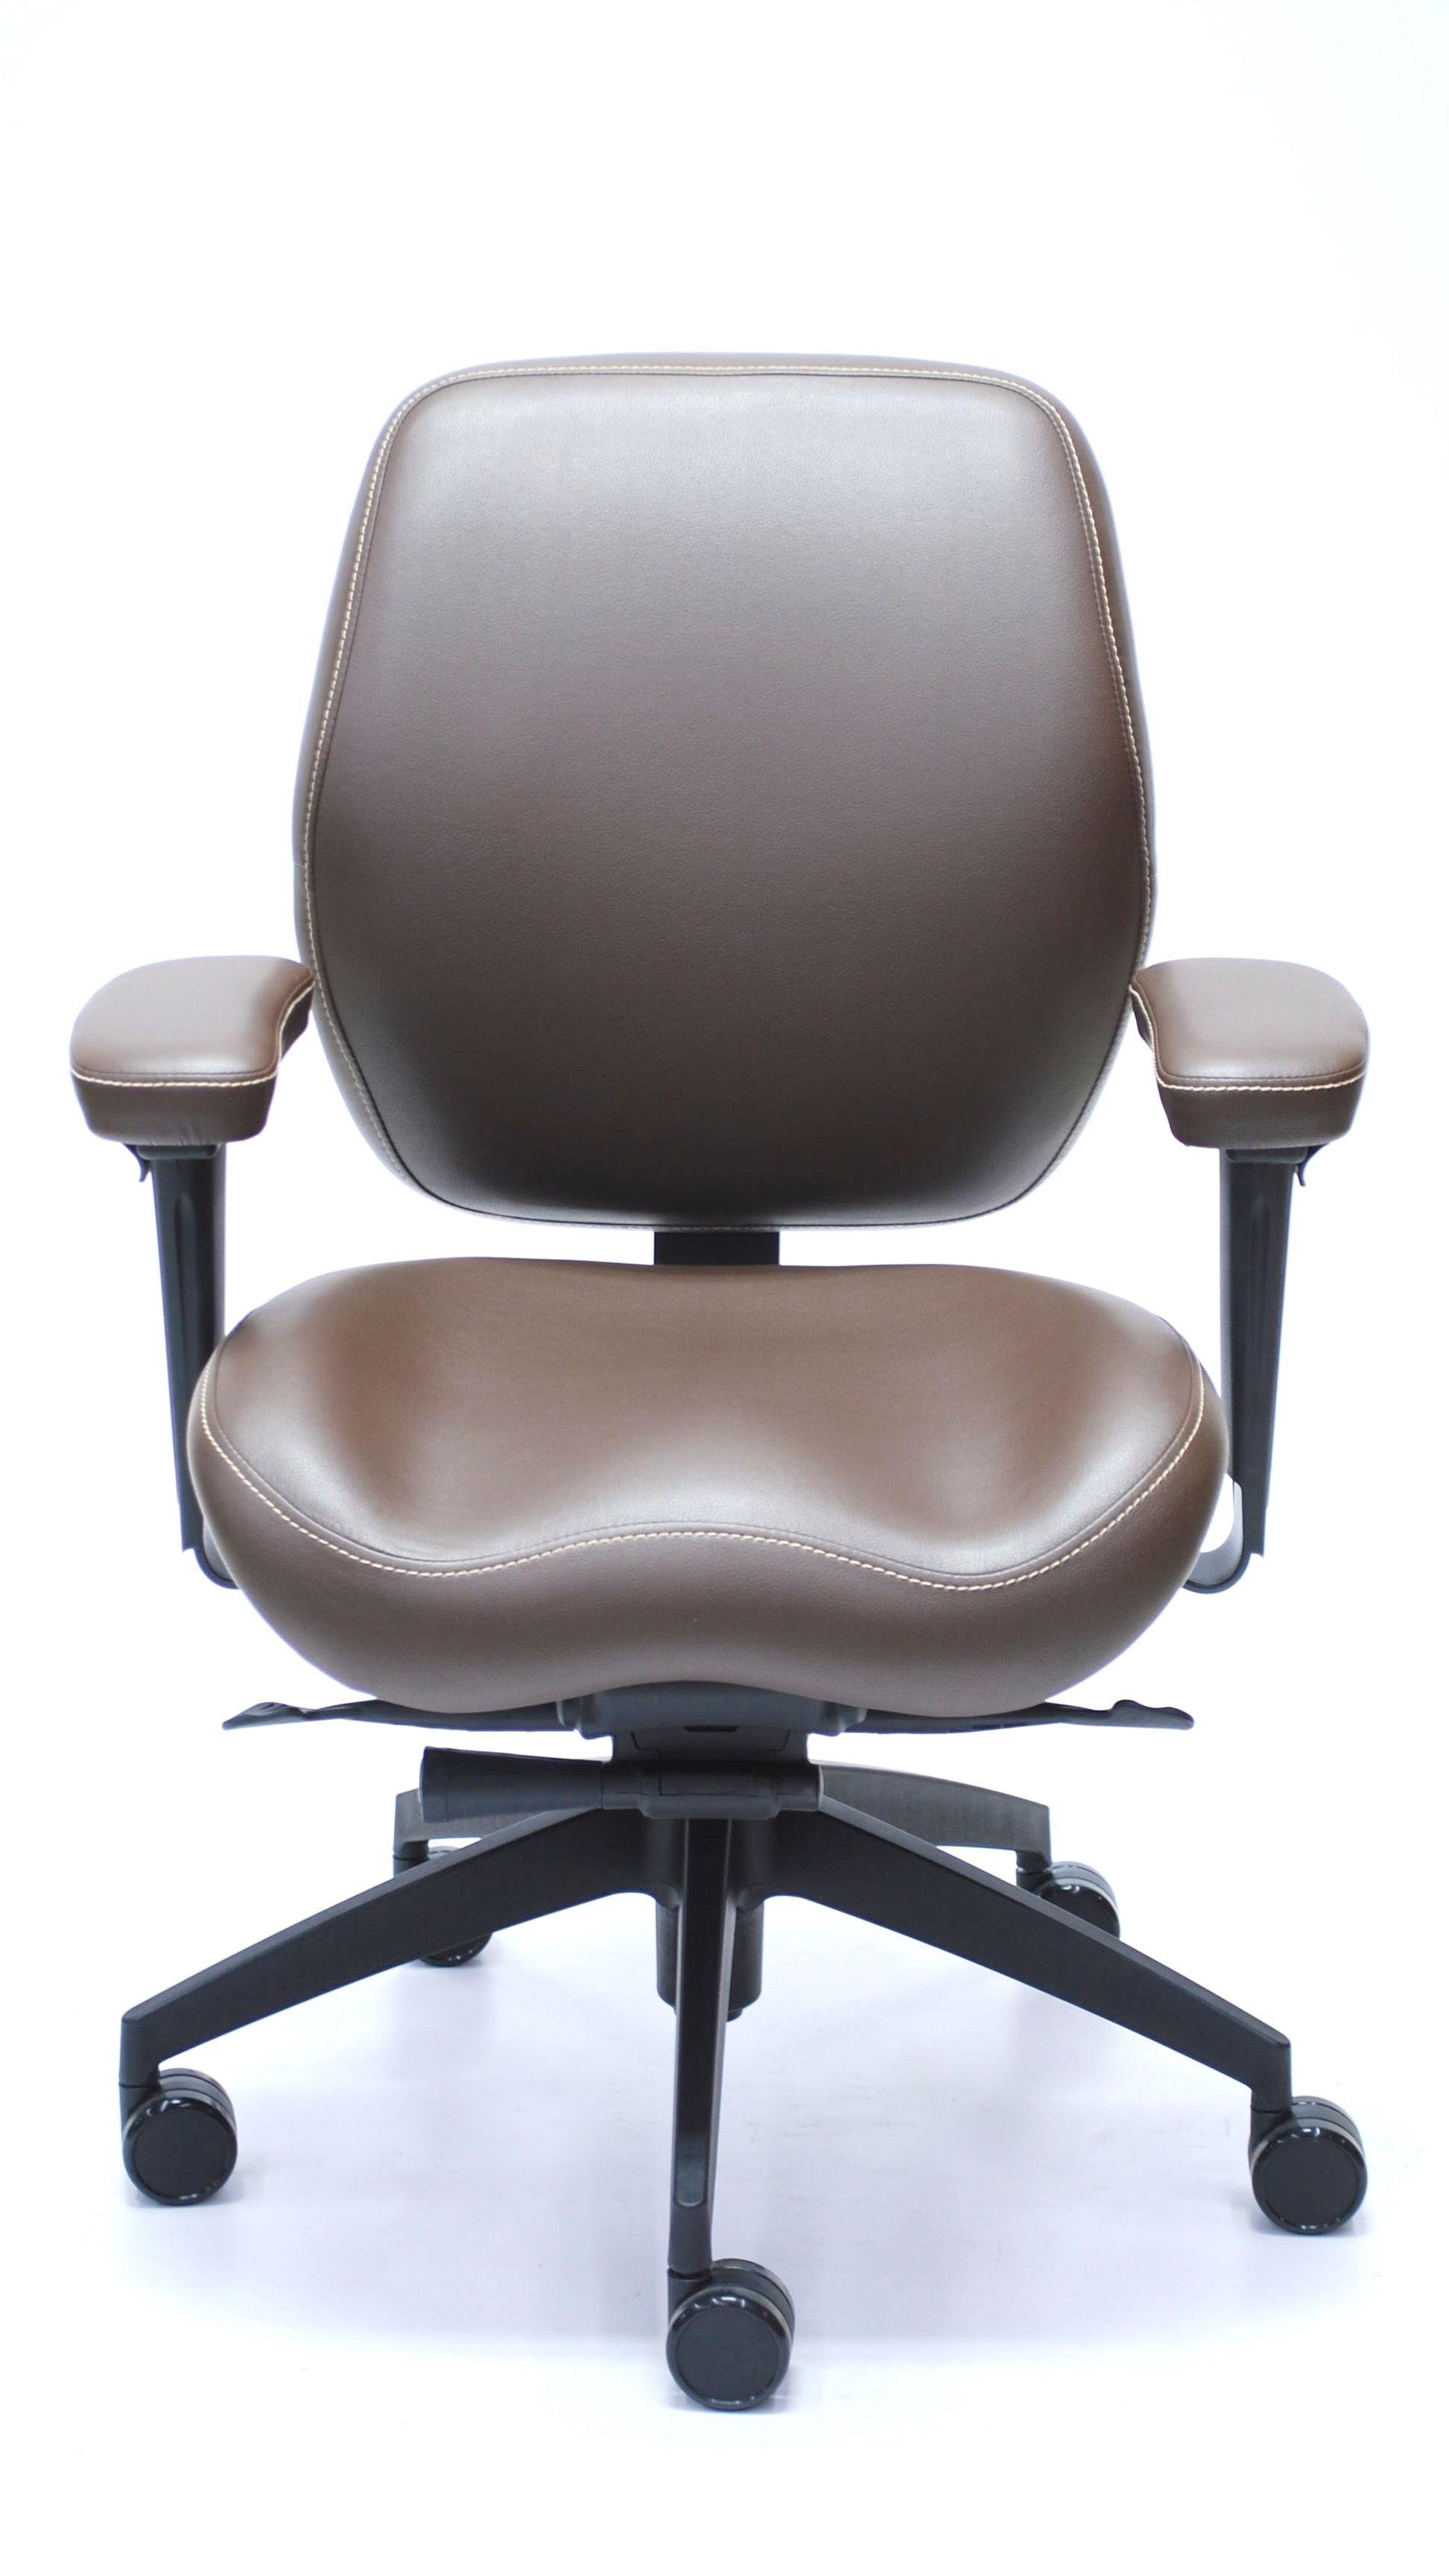 Balance Management Mid Back 5694 Chair Desk Chair Faux Leather